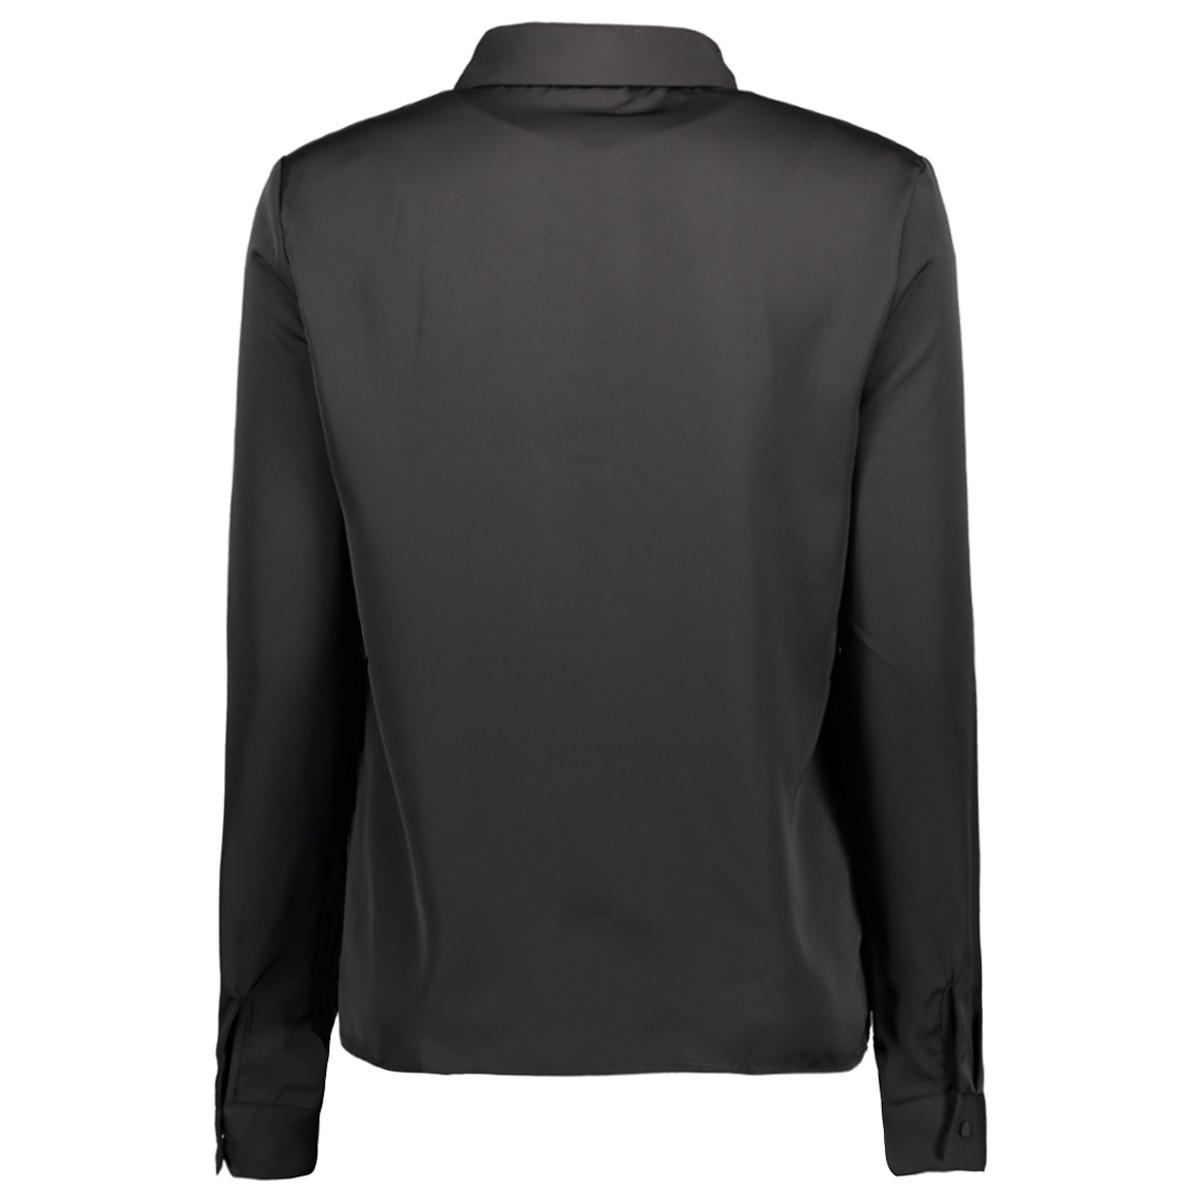 nmchella l/s shirt x 27001227 noisy may blouse black